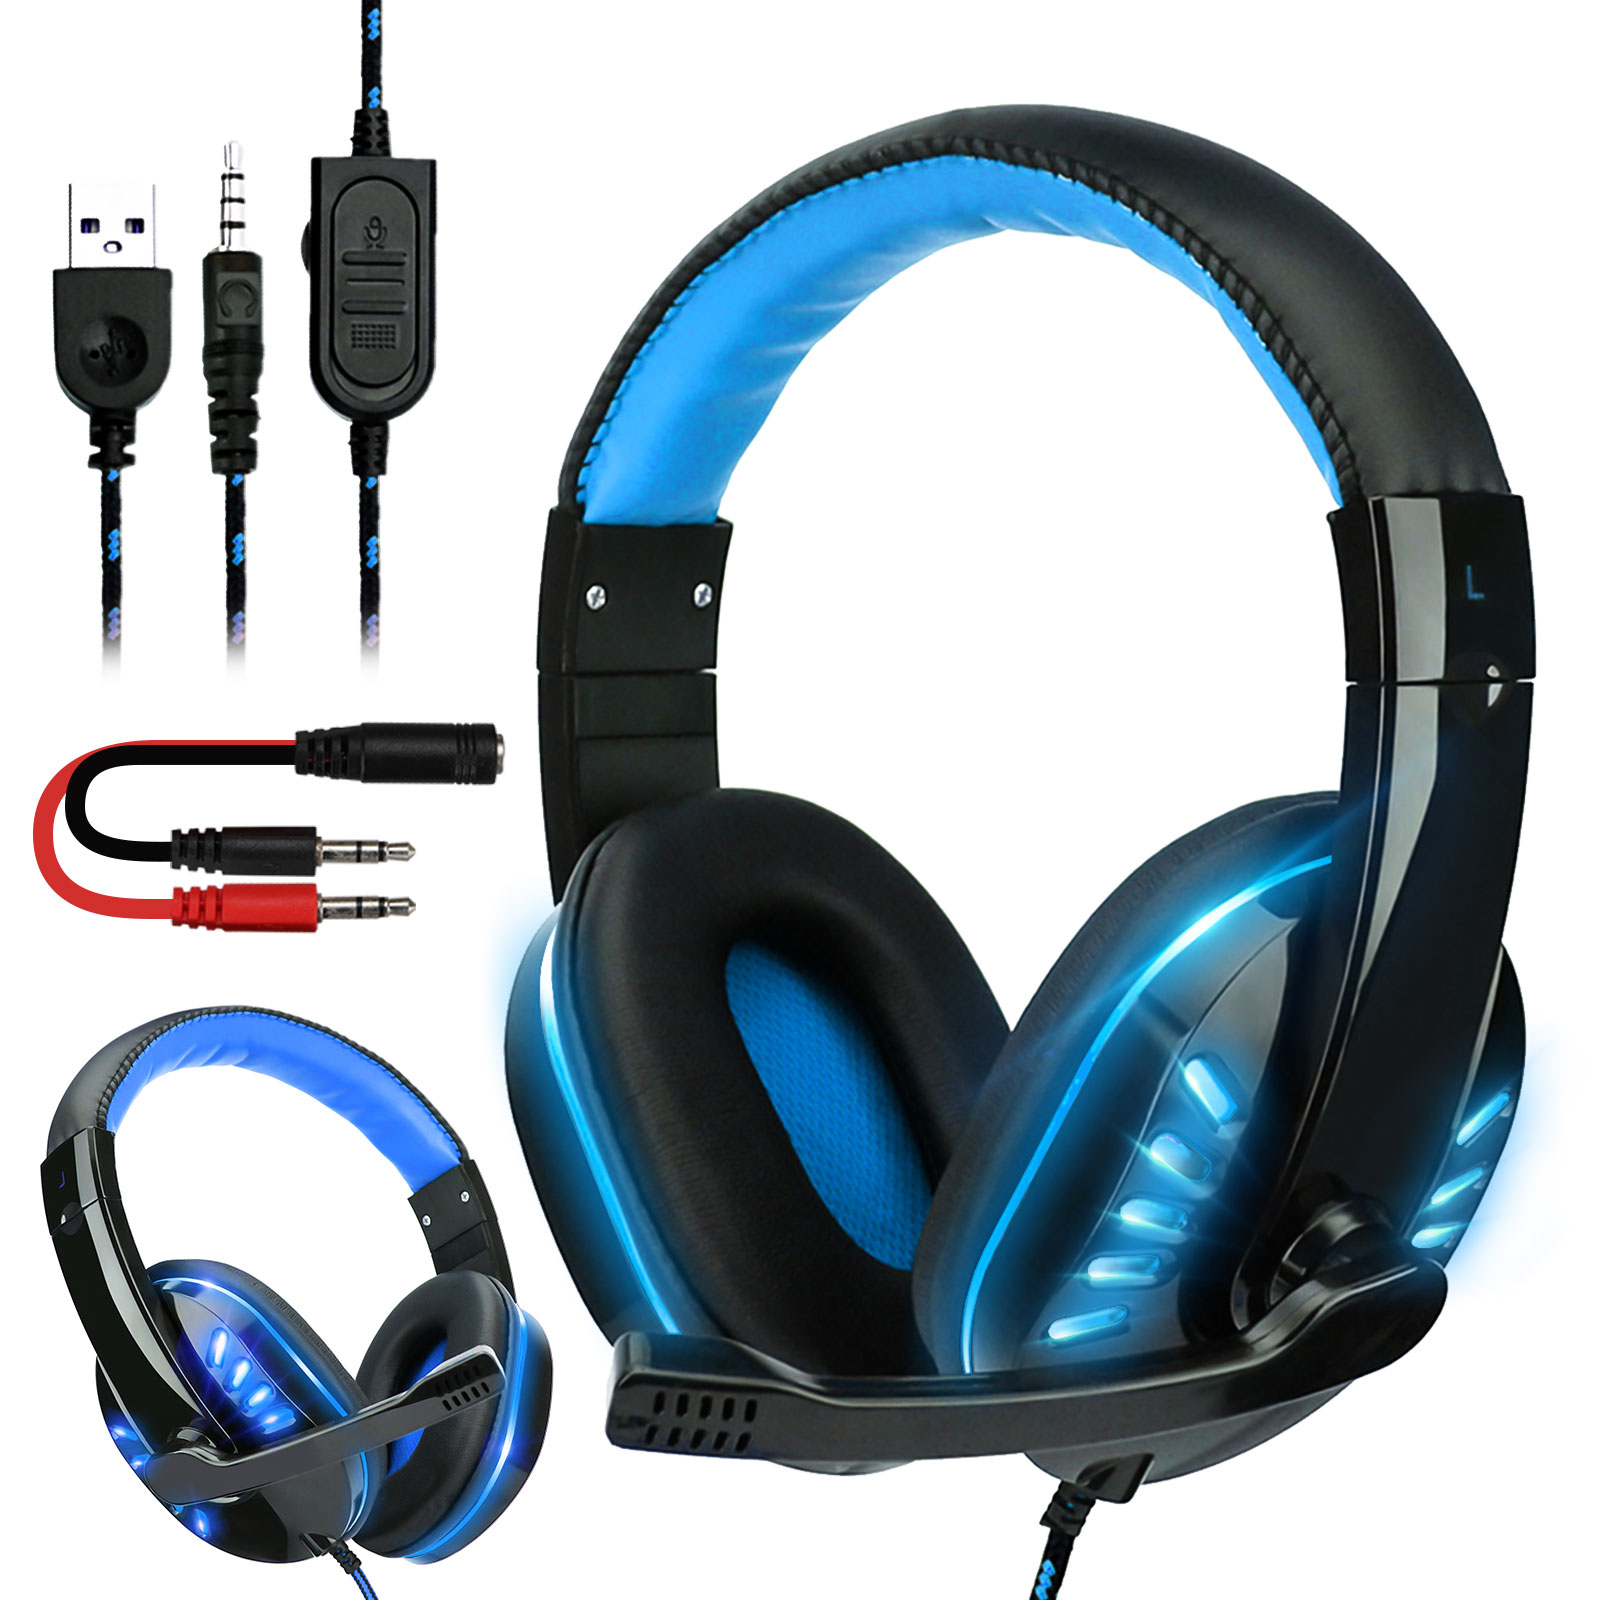 3.5mm Stereo Bass Gaming Headset with Mic Headphone Earphone